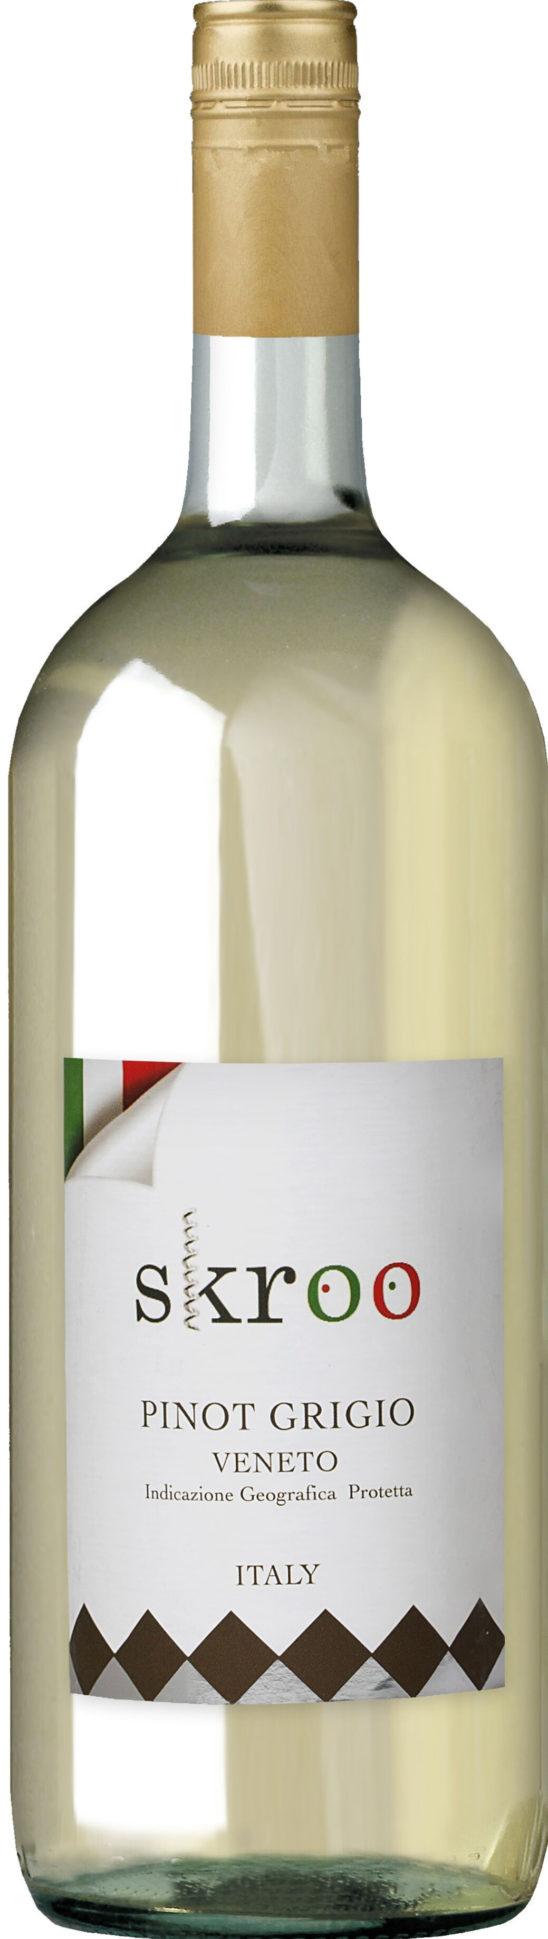 Skroo Pinot Grigio